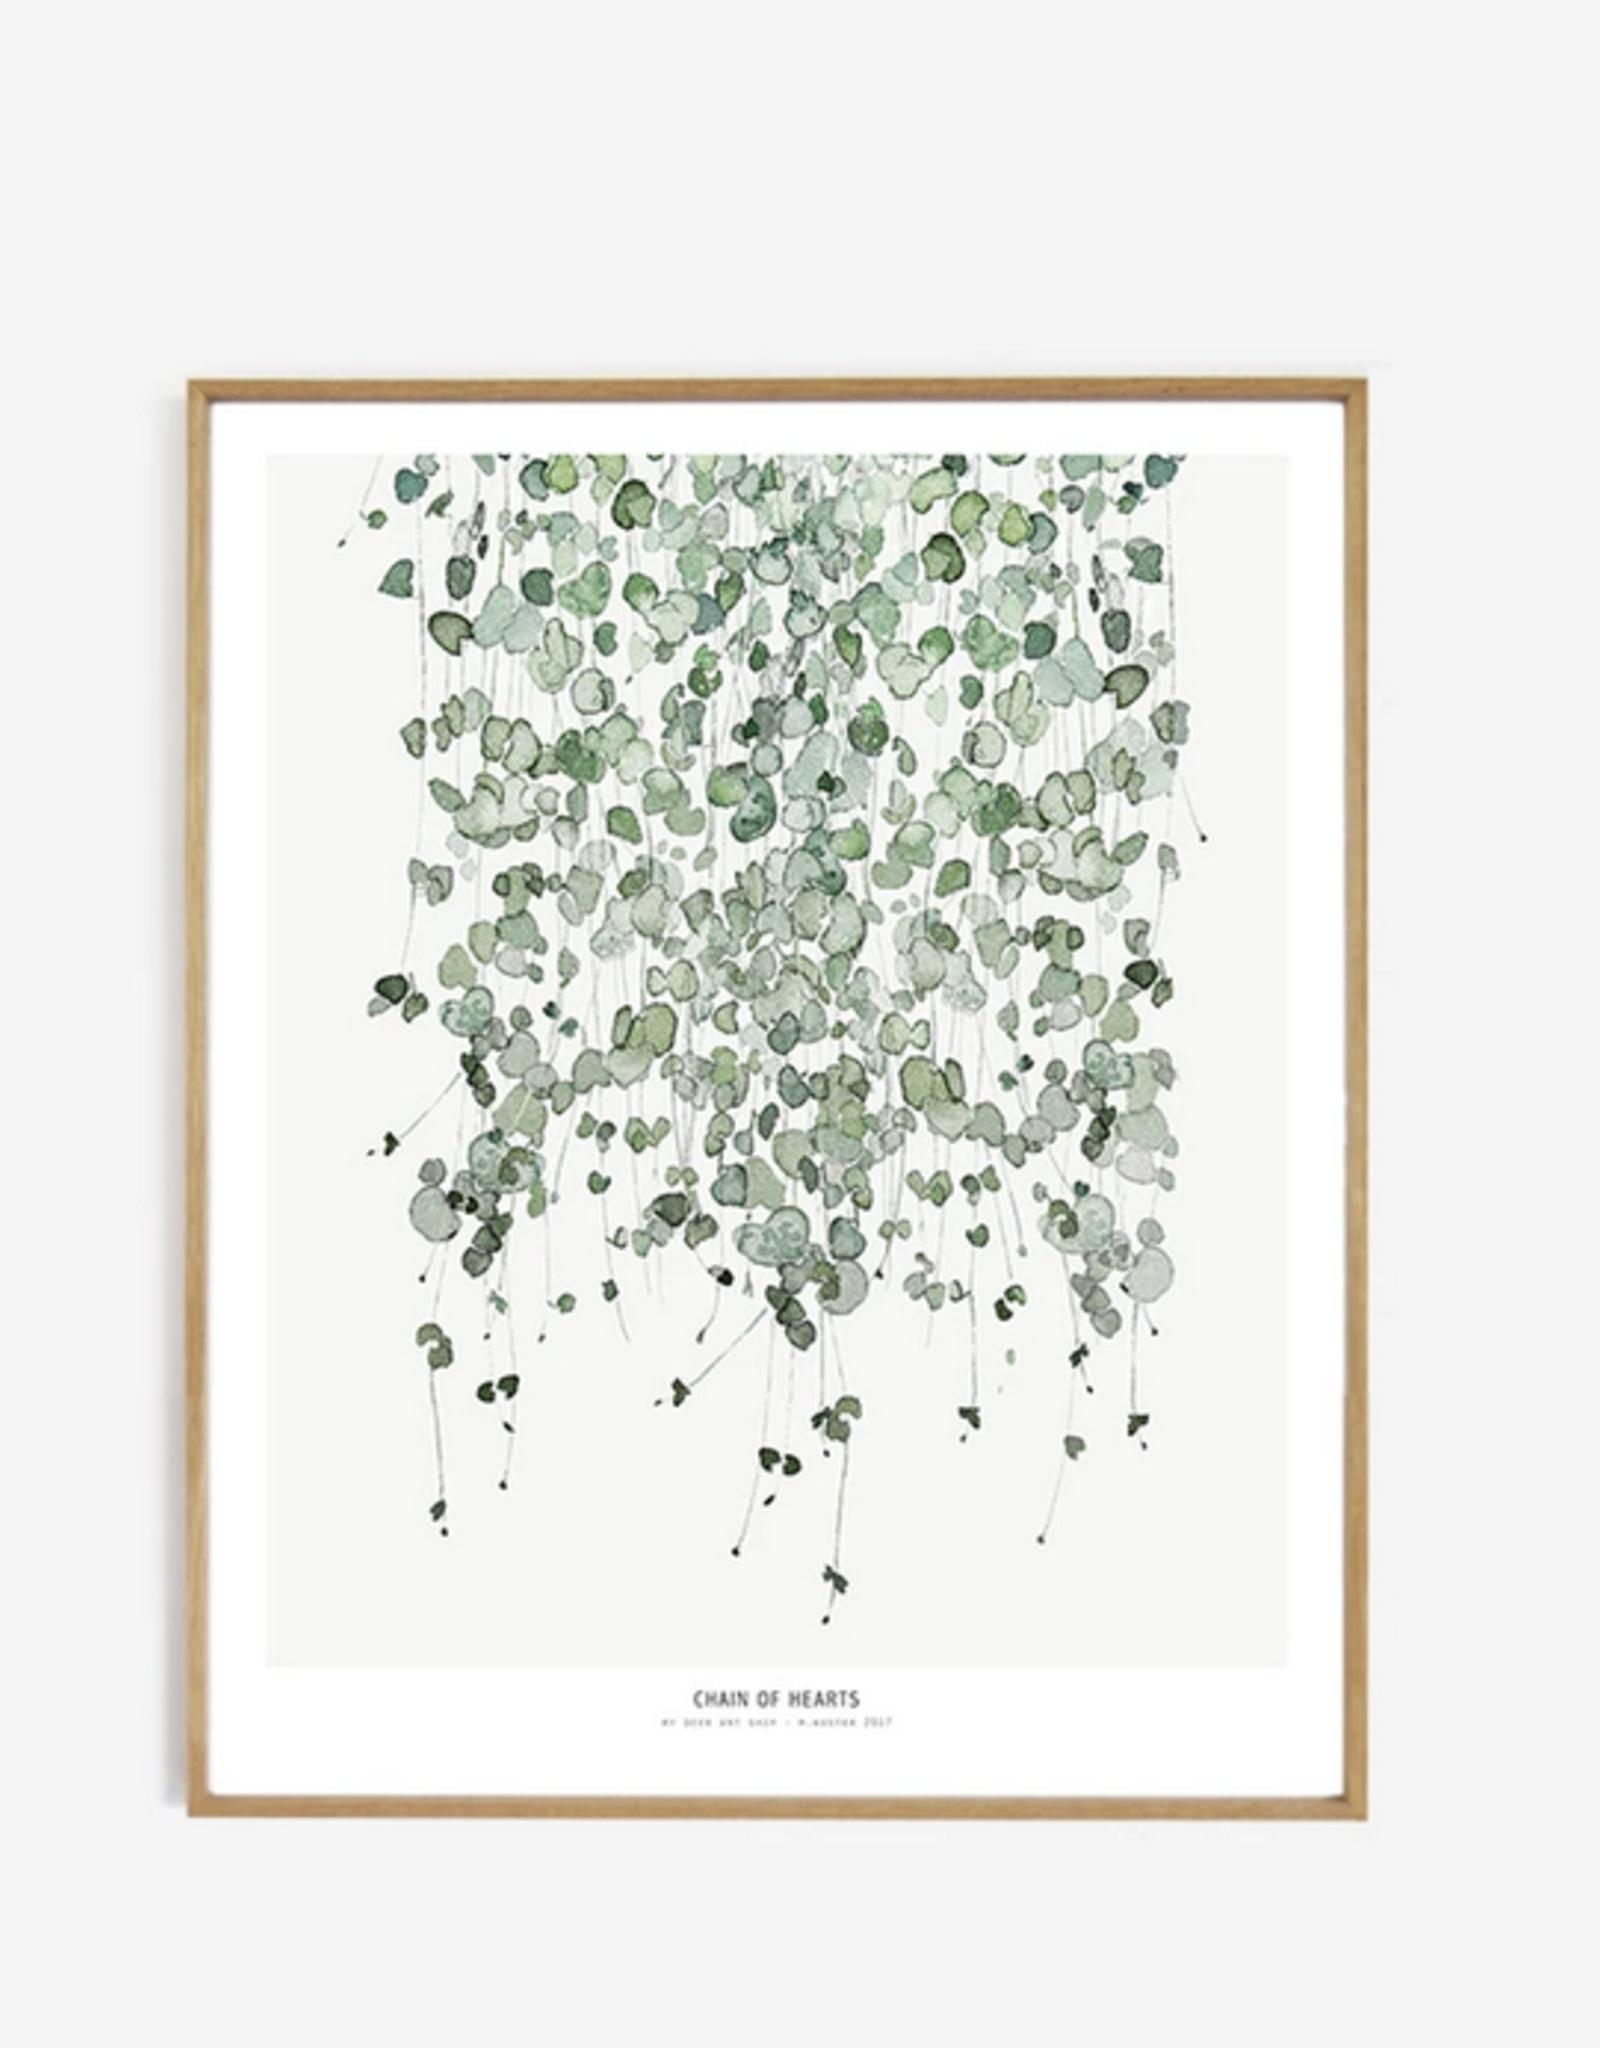 My deer art shop My deer art - Chain of hearts - 50x70